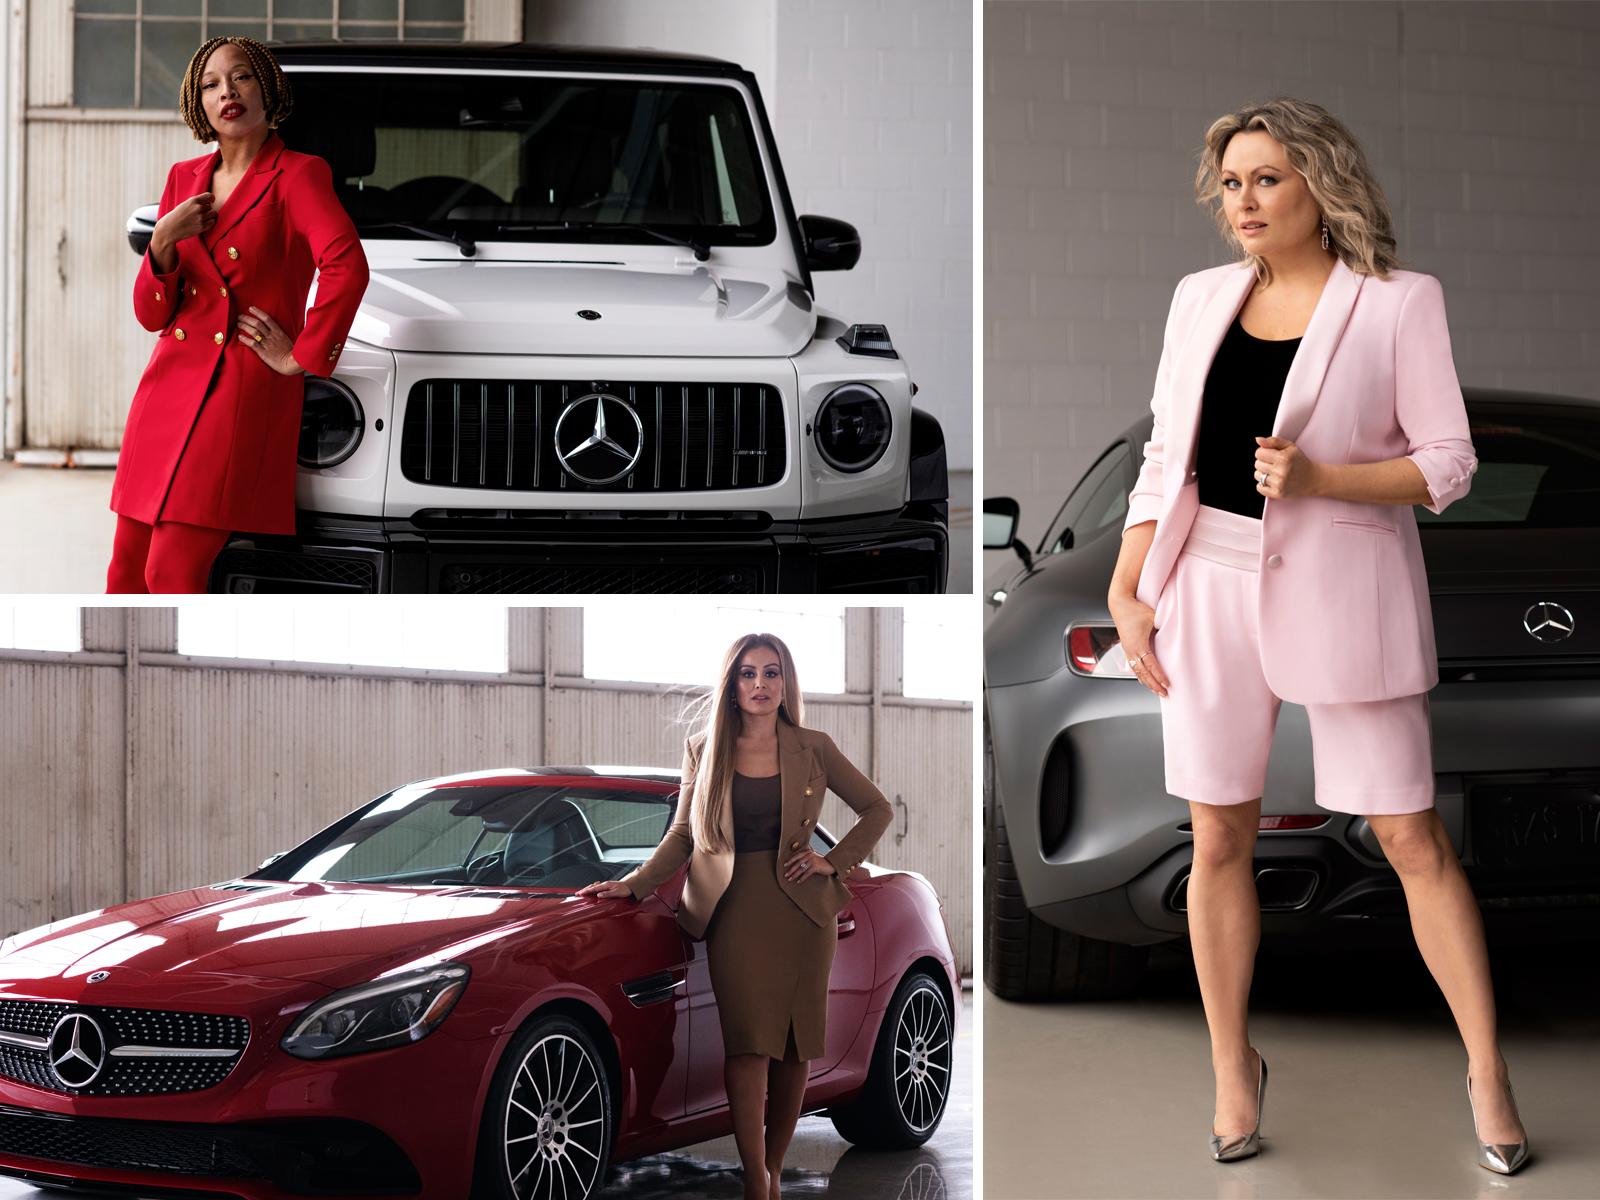 Three high-profile Canadian women—Mitsou Gélinas, Melissa Grelo, and Stacey McKenzie